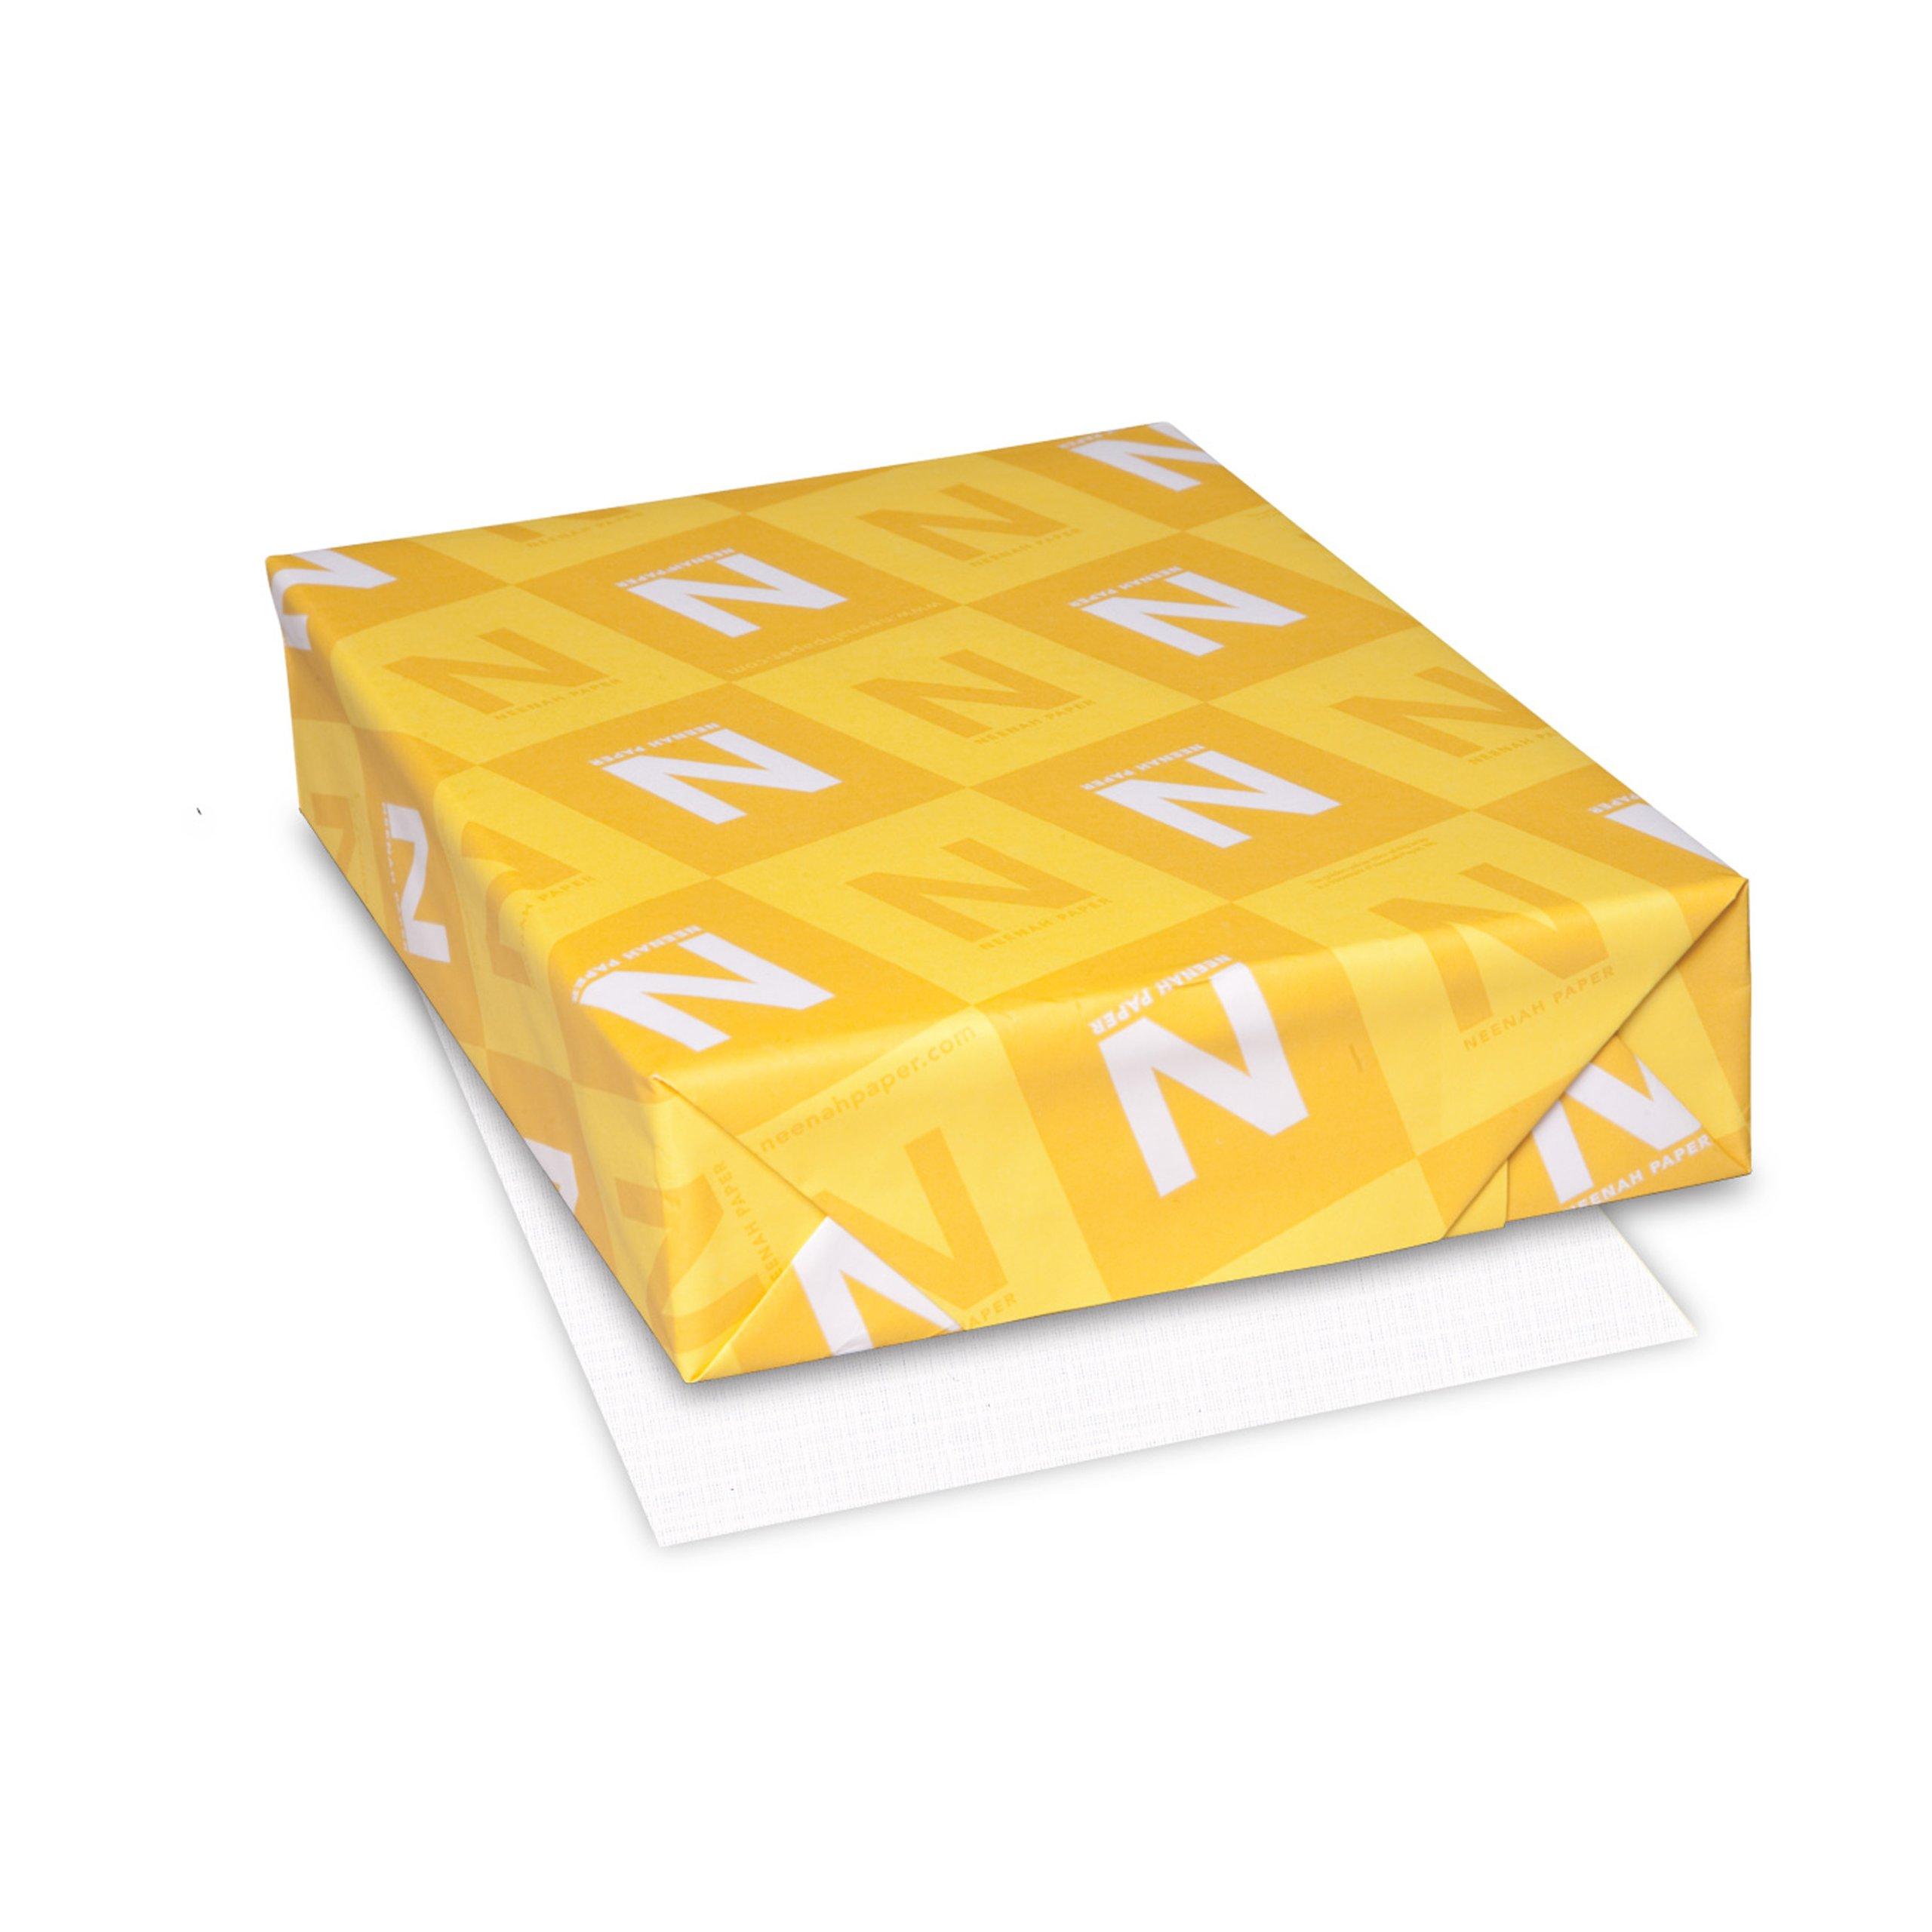 Neenah Royal Sundance Linen Writing Paper, 8.5'' x 11'', 24 lb/ 89 gsm, Brilliant White 98 Brightness, 500 Sheets (75101)